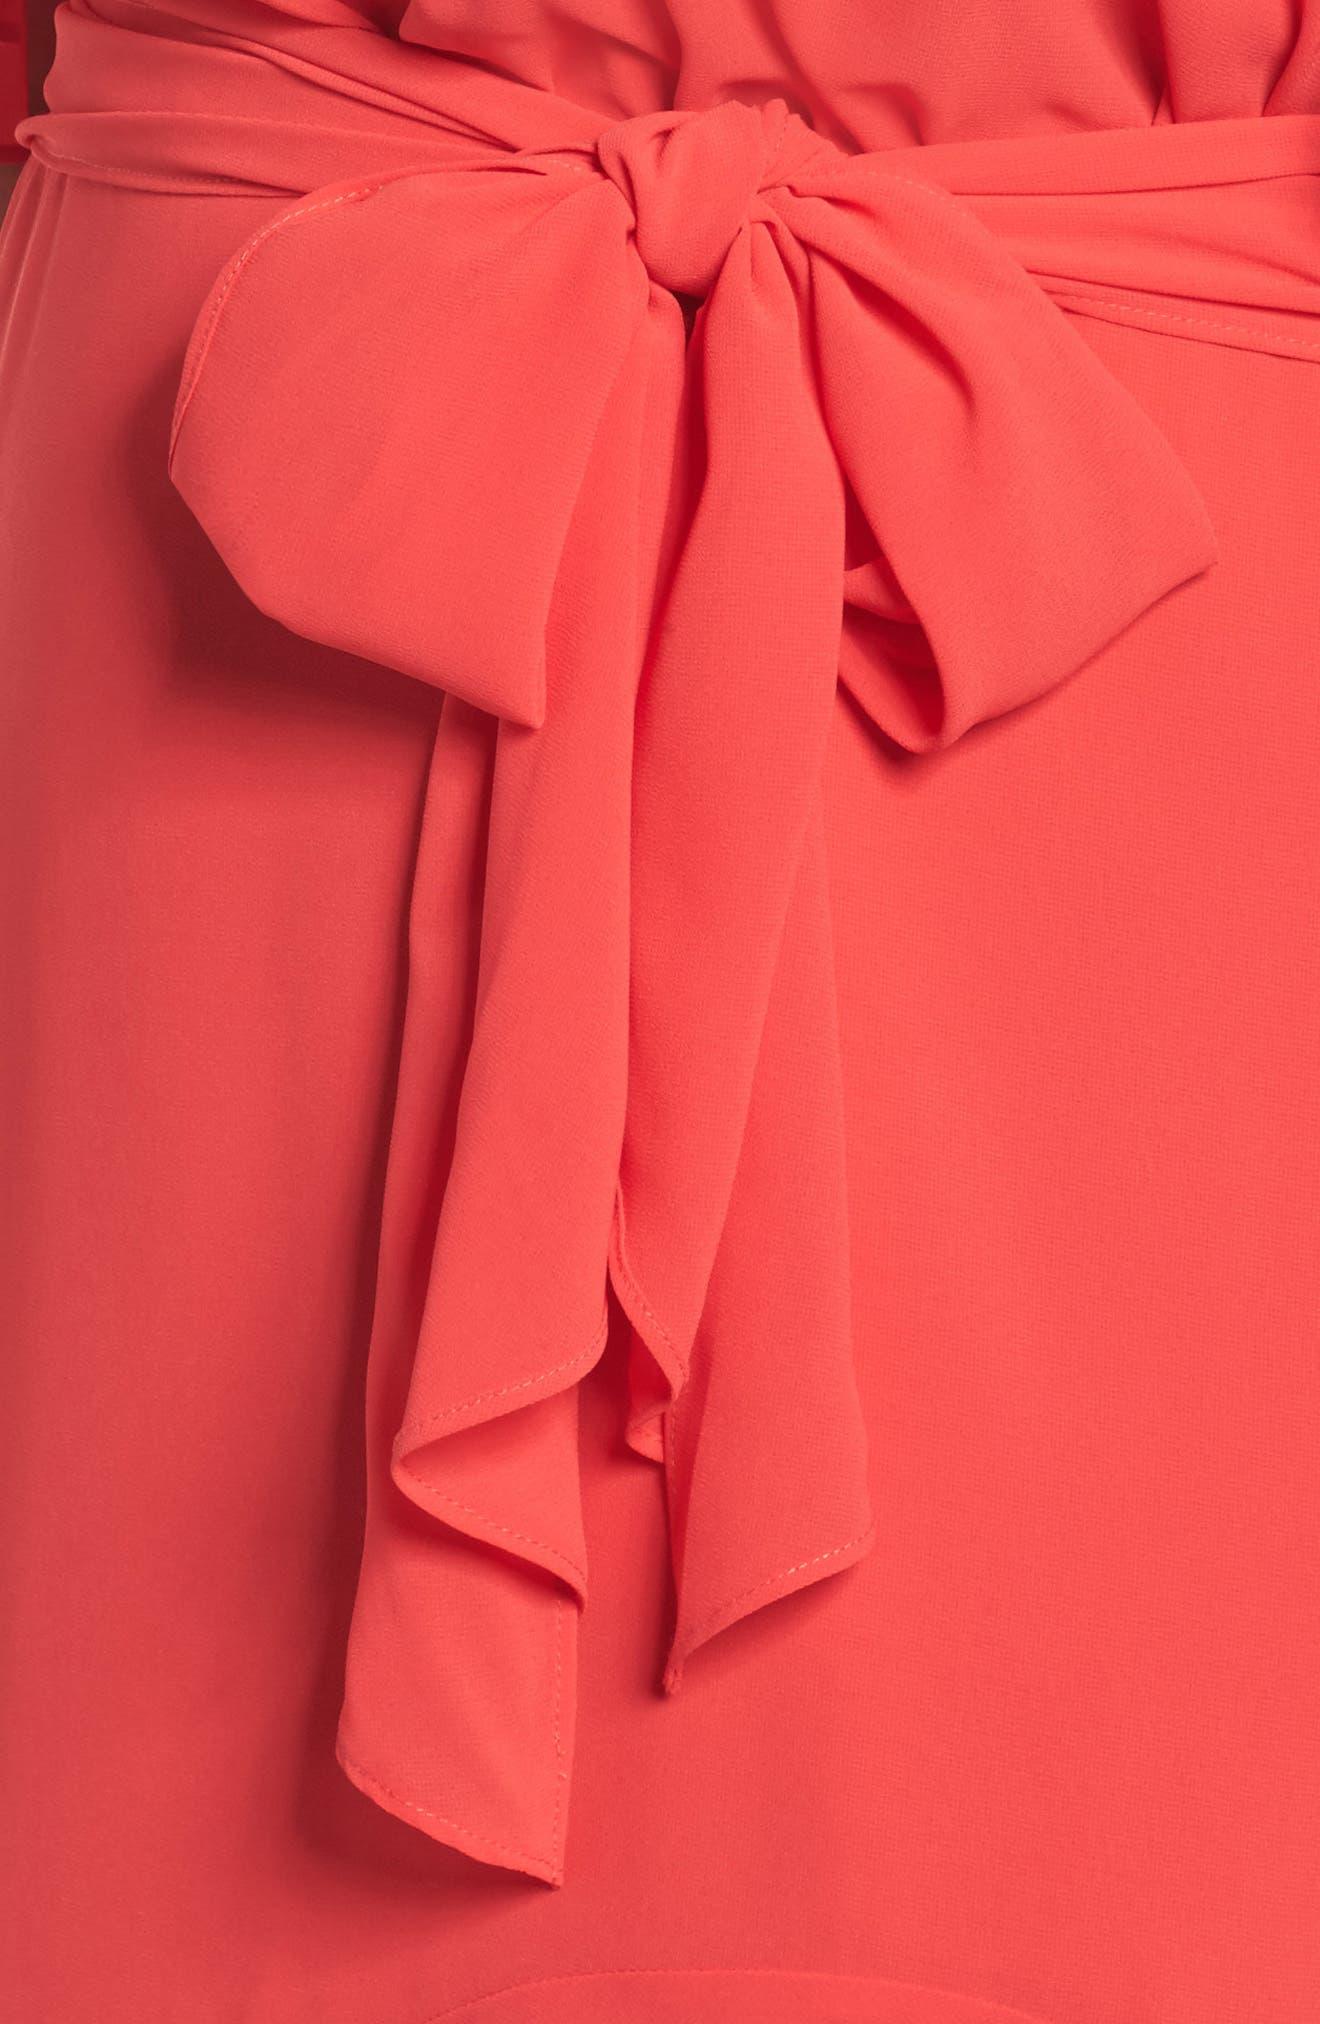 Cold Shoulder Midi Dress,                             Alternate thumbnail 4, color,                             650